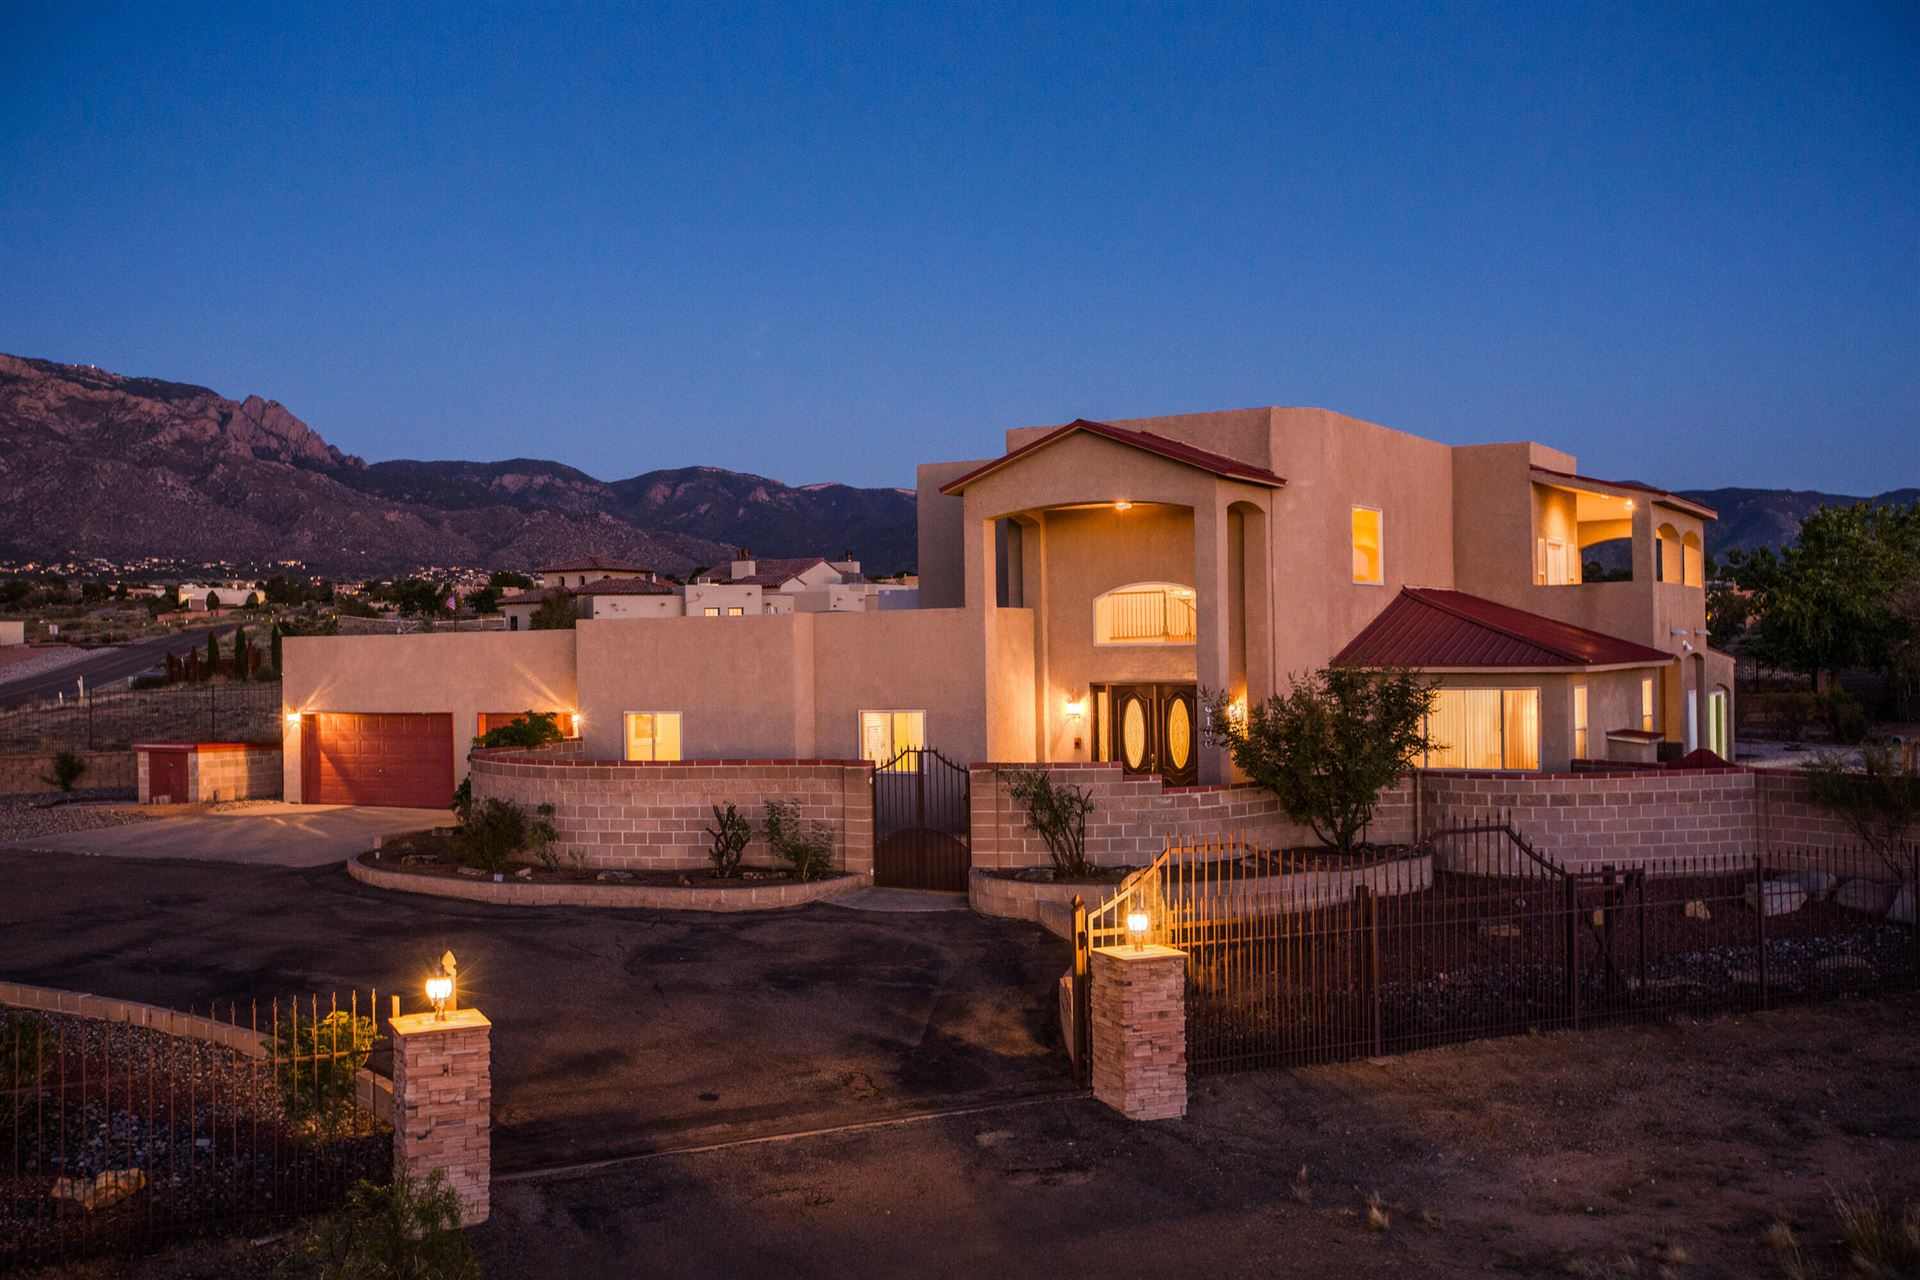 Photo of 9100 ELENA Drive NE, Albuquerque, NM 87122 (MLS # 1001624)